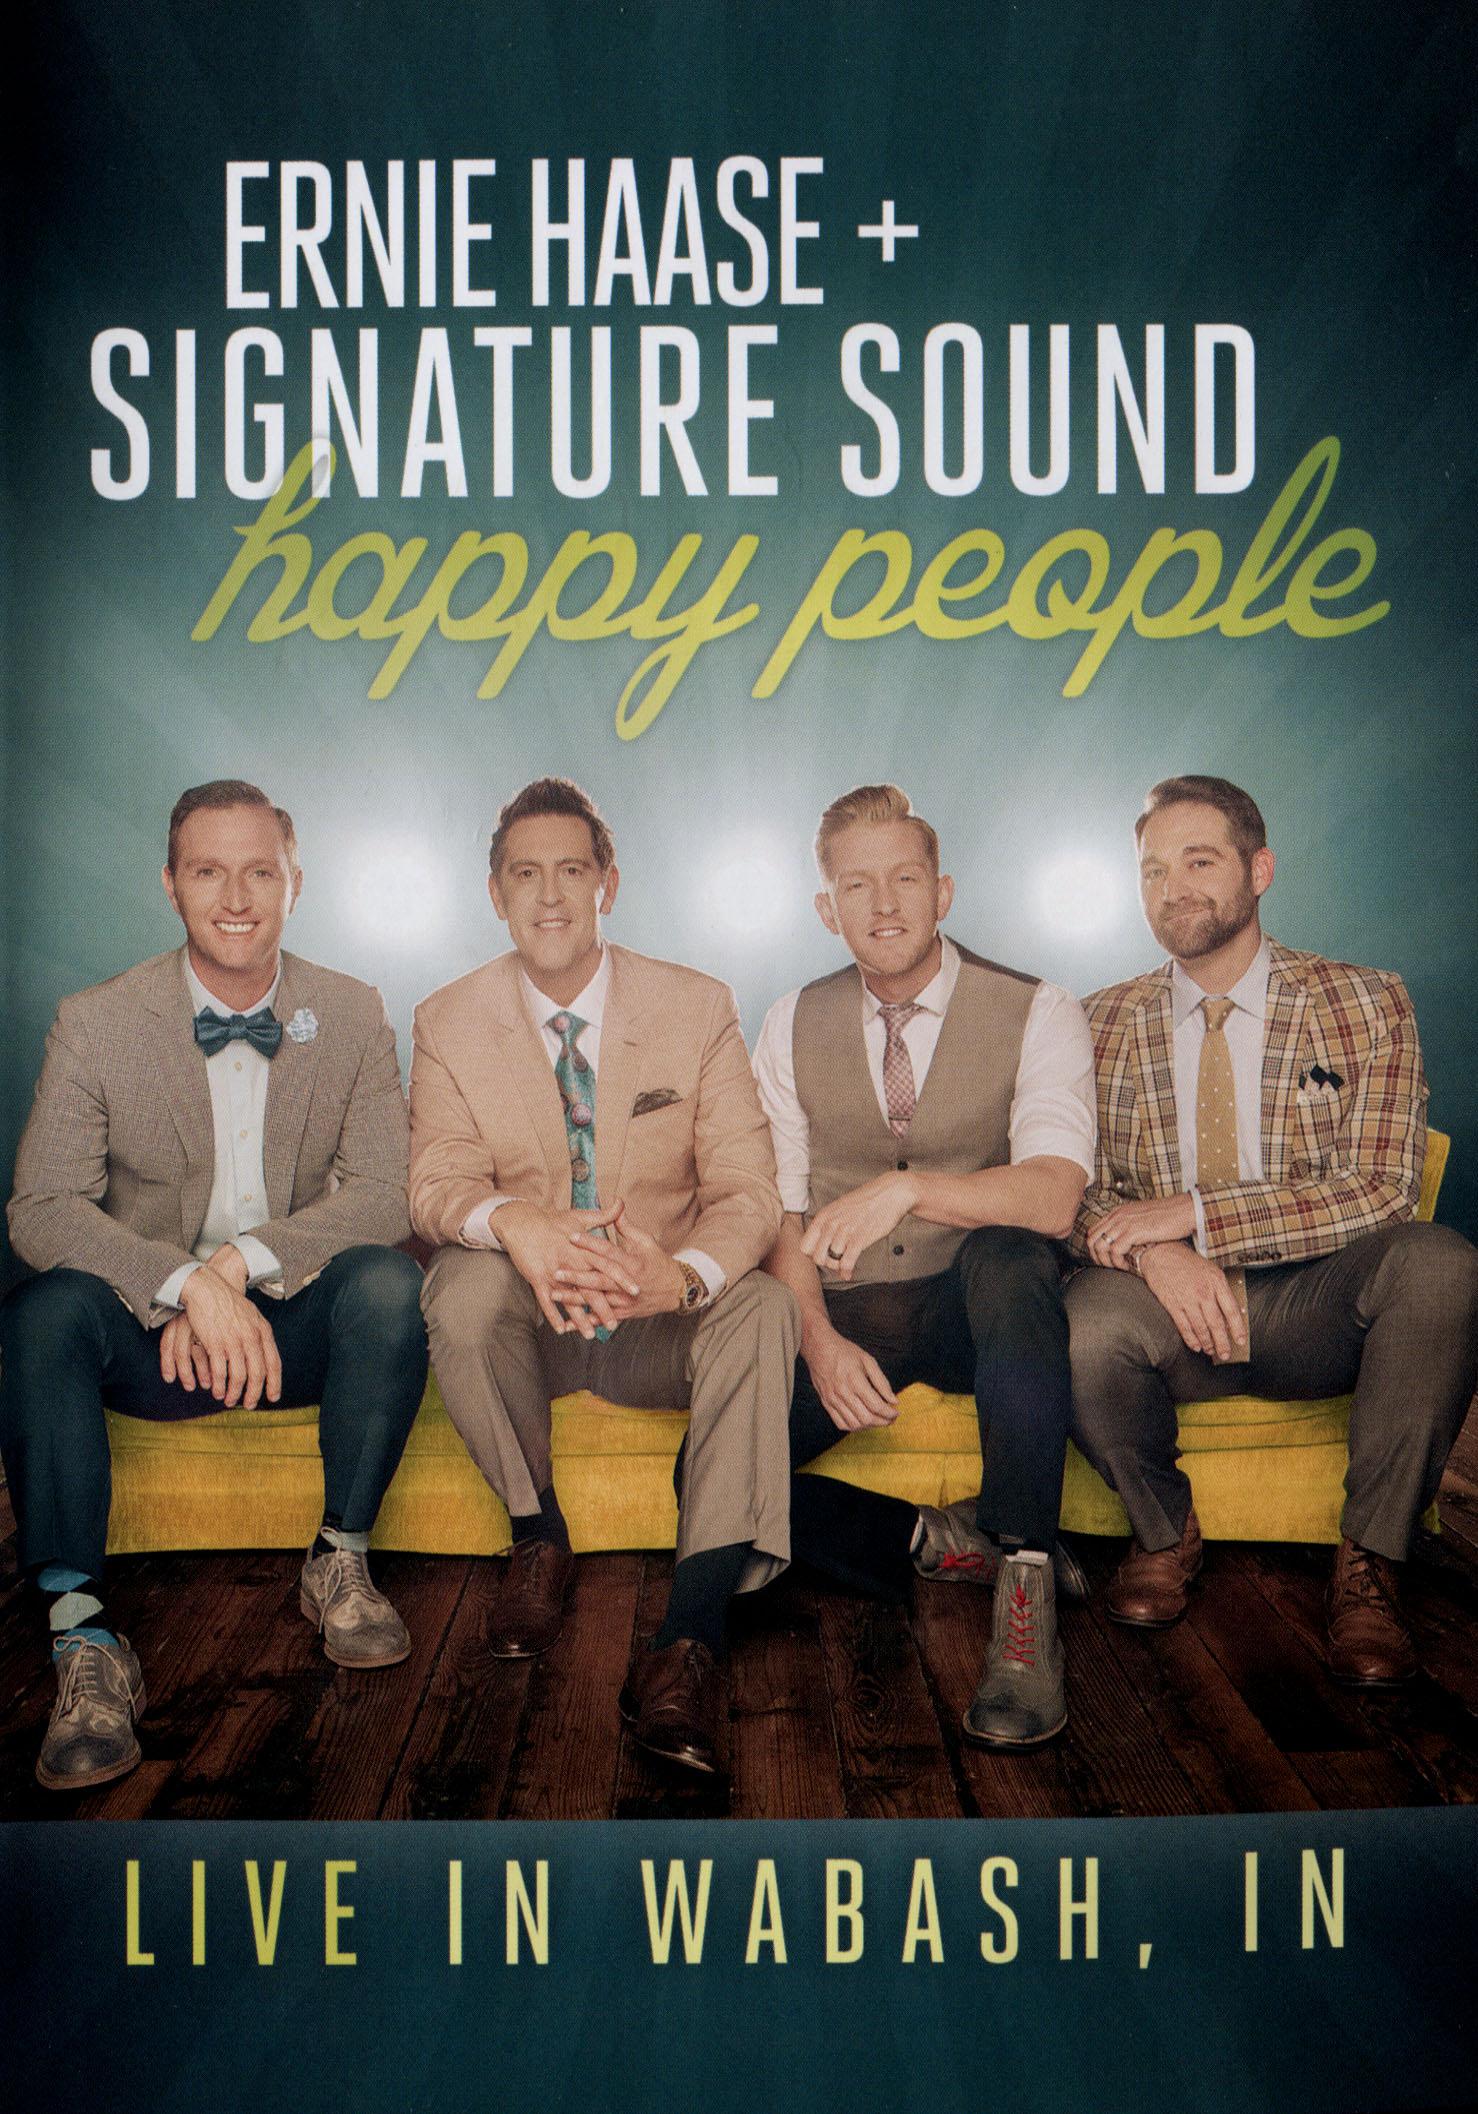 Ernie Haase + Signature Sound: Happy People